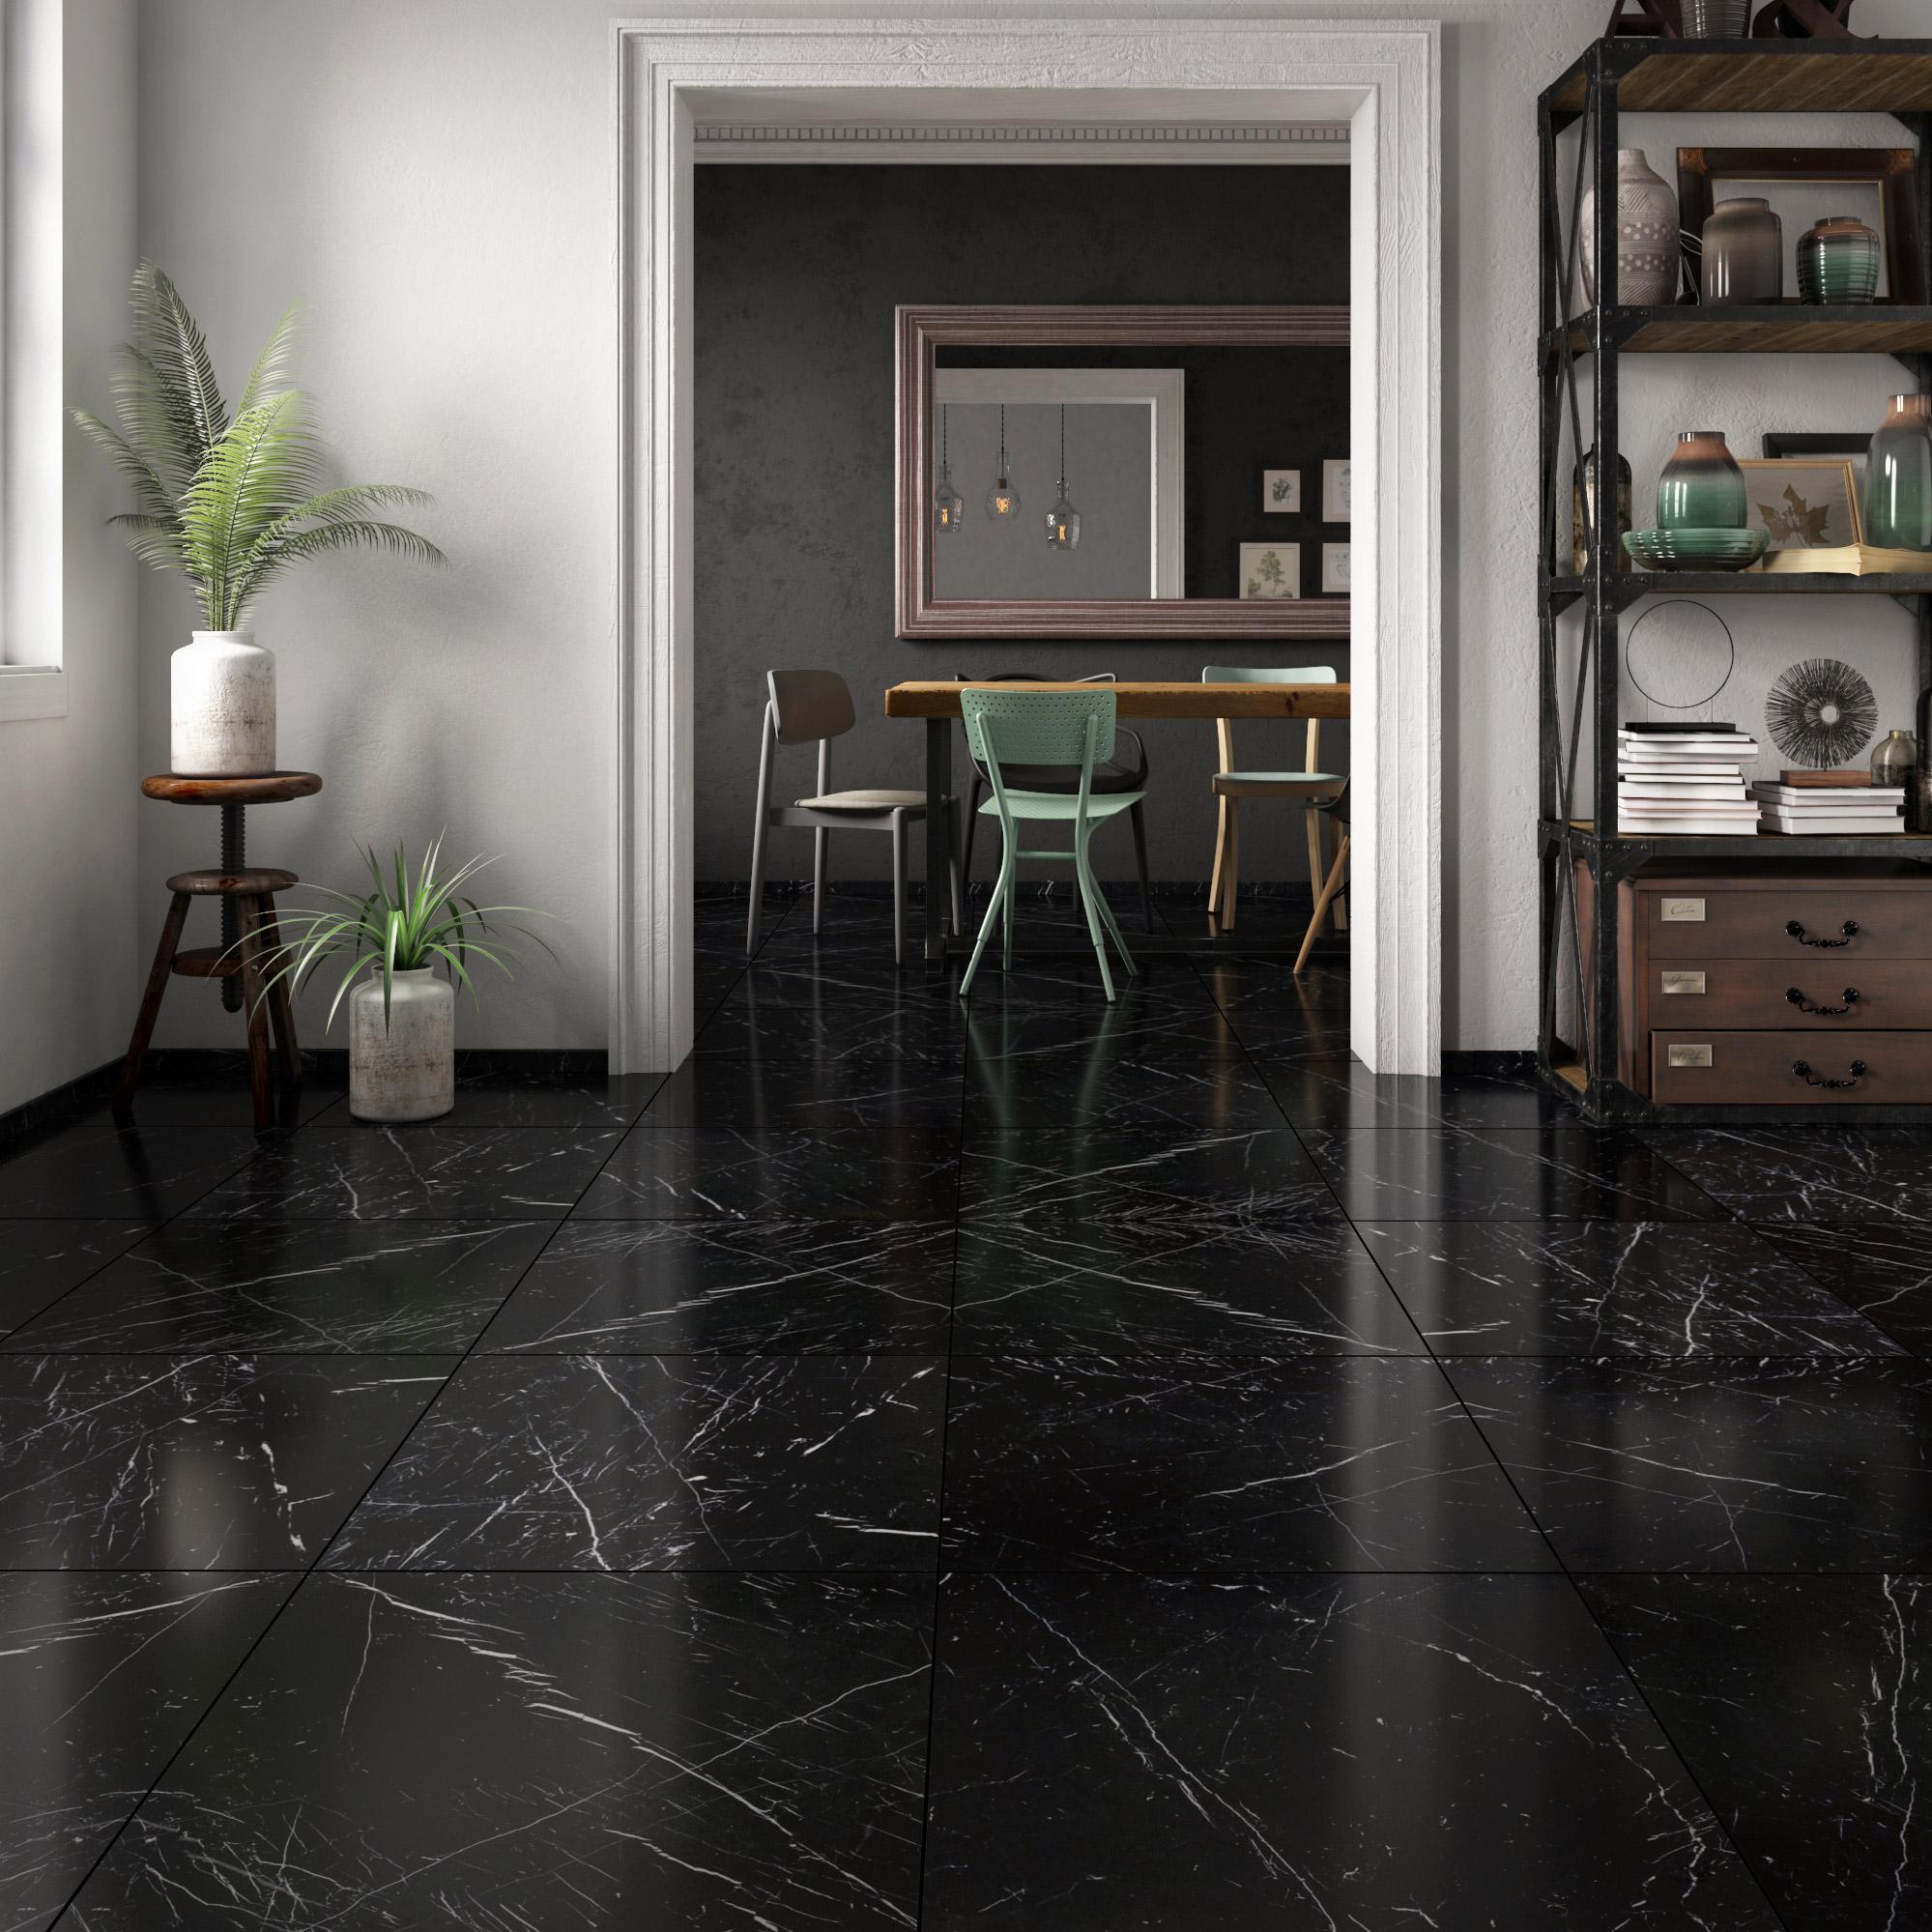 carrelage sol et mur noir effet marbre rimini x. Black Bedroom Furniture Sets. Home Design Ideas